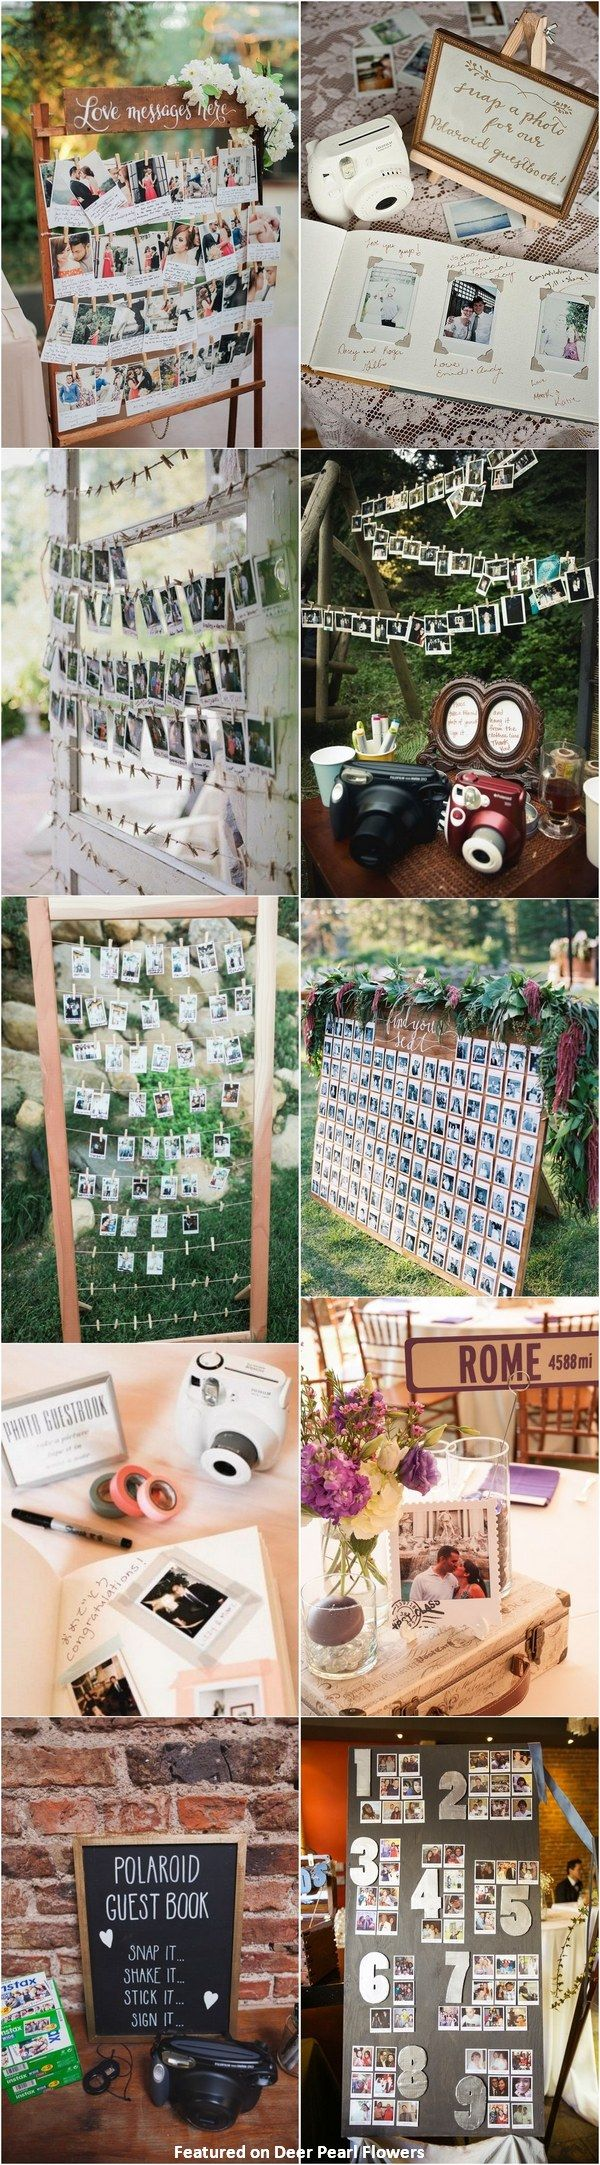 unique wedding ideas - Polaroid wedding reception decor ideas / http://www.deerpearlflowers.com/creative-polaroid-wedding-ideas/ I LOVE THIS!!